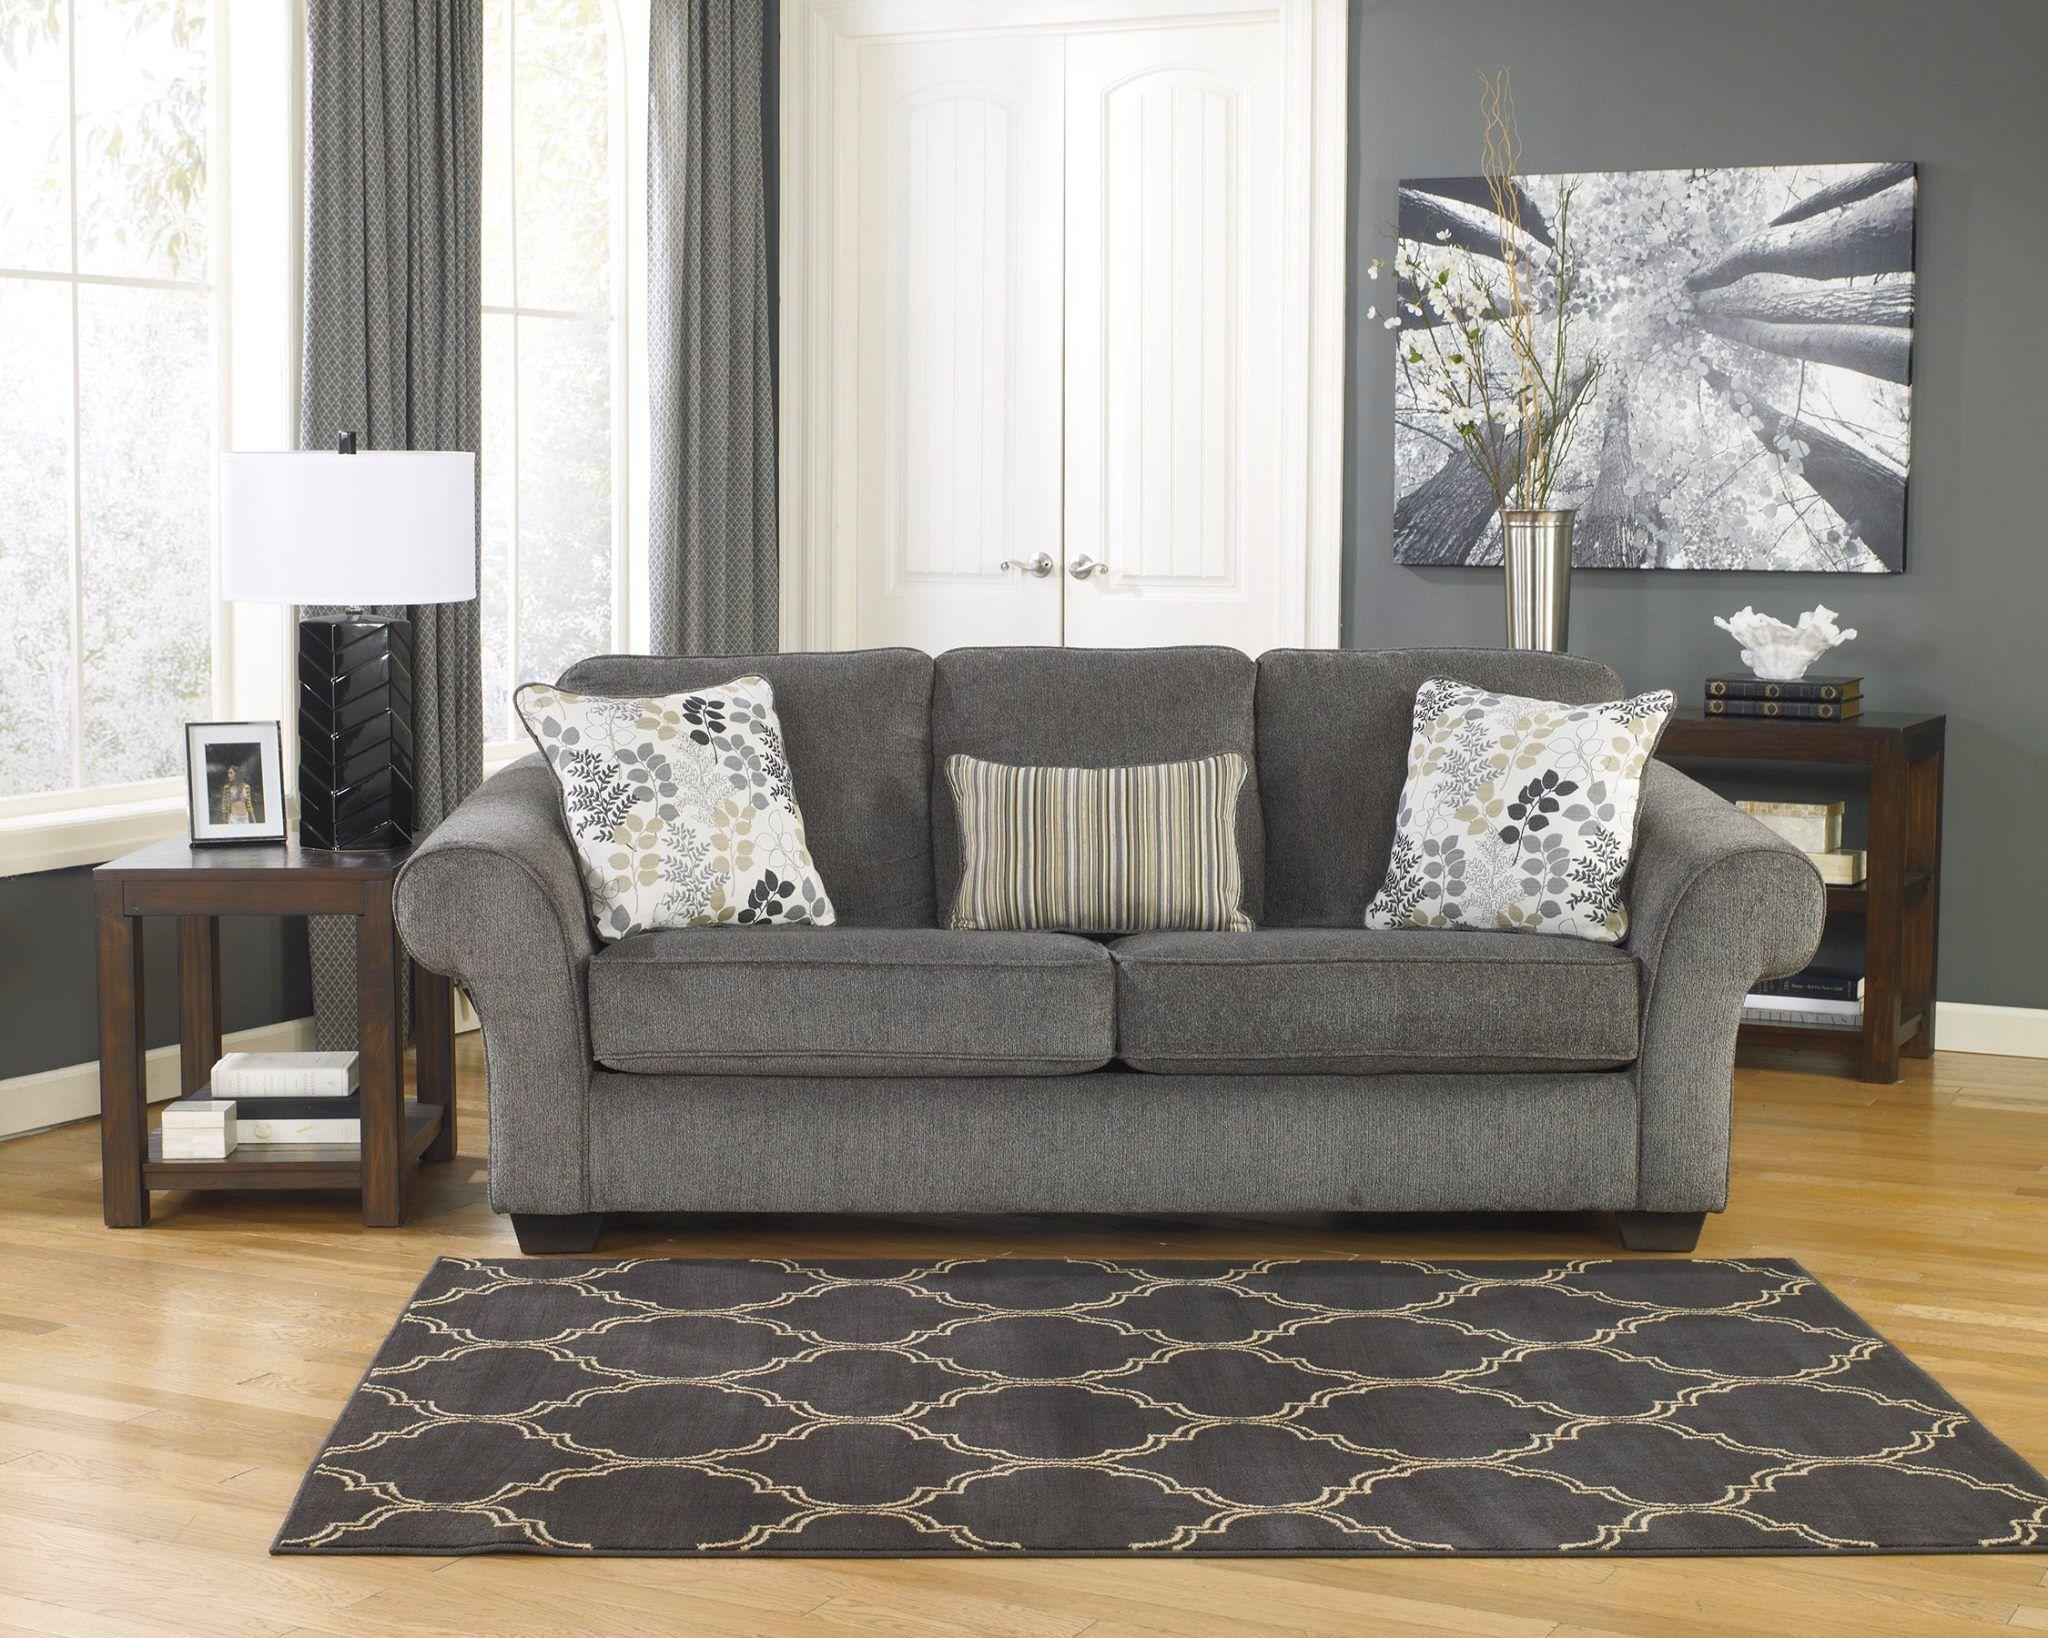 Ashley Furniture Homestore House Family Room Sofa Living Room